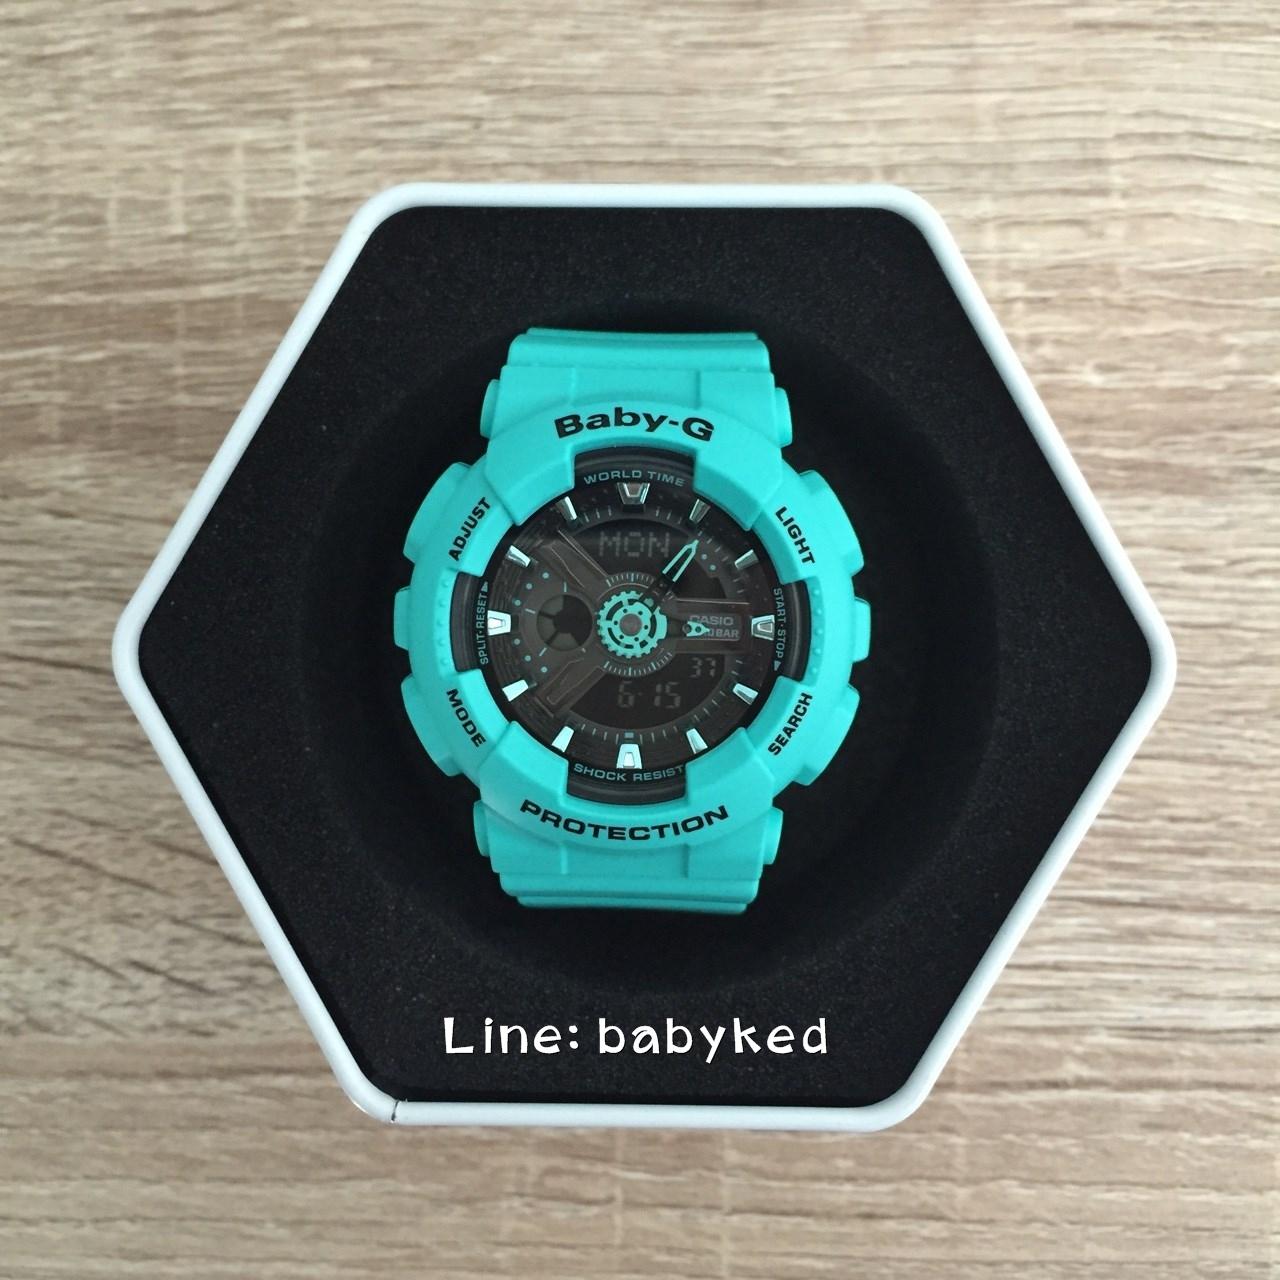 Baby-G BA-111-3 สีเทอคว๊อย ของแท้100% ของใหม่อุปกรณ์ครบ 3,700 บาท